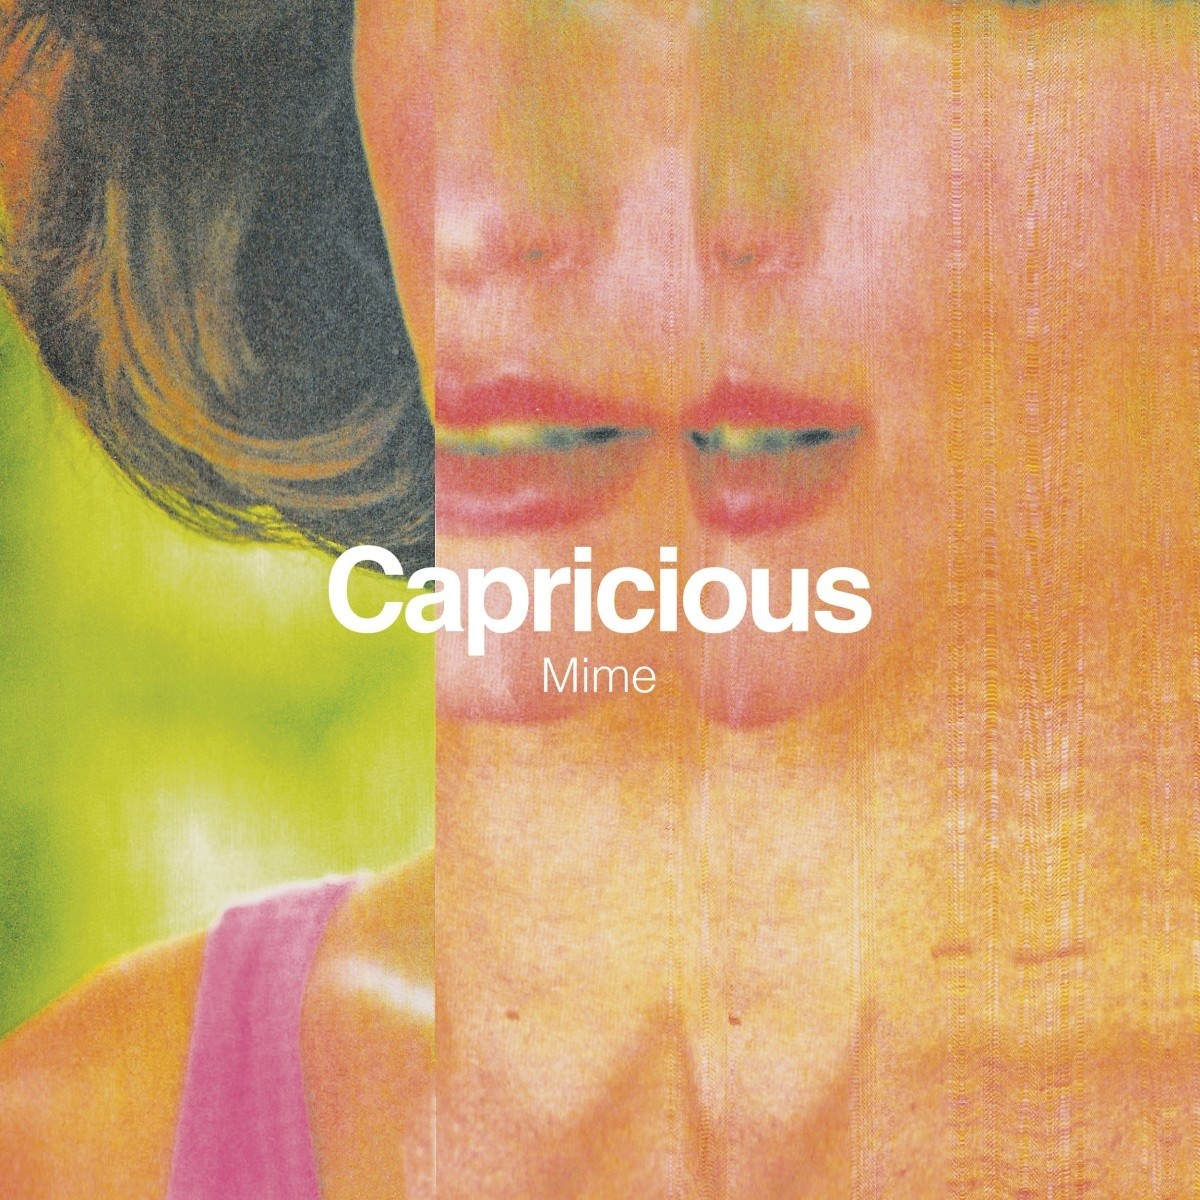 Mime (マイム)  – Capricious [FLAC / WEB] [2018.09.19]